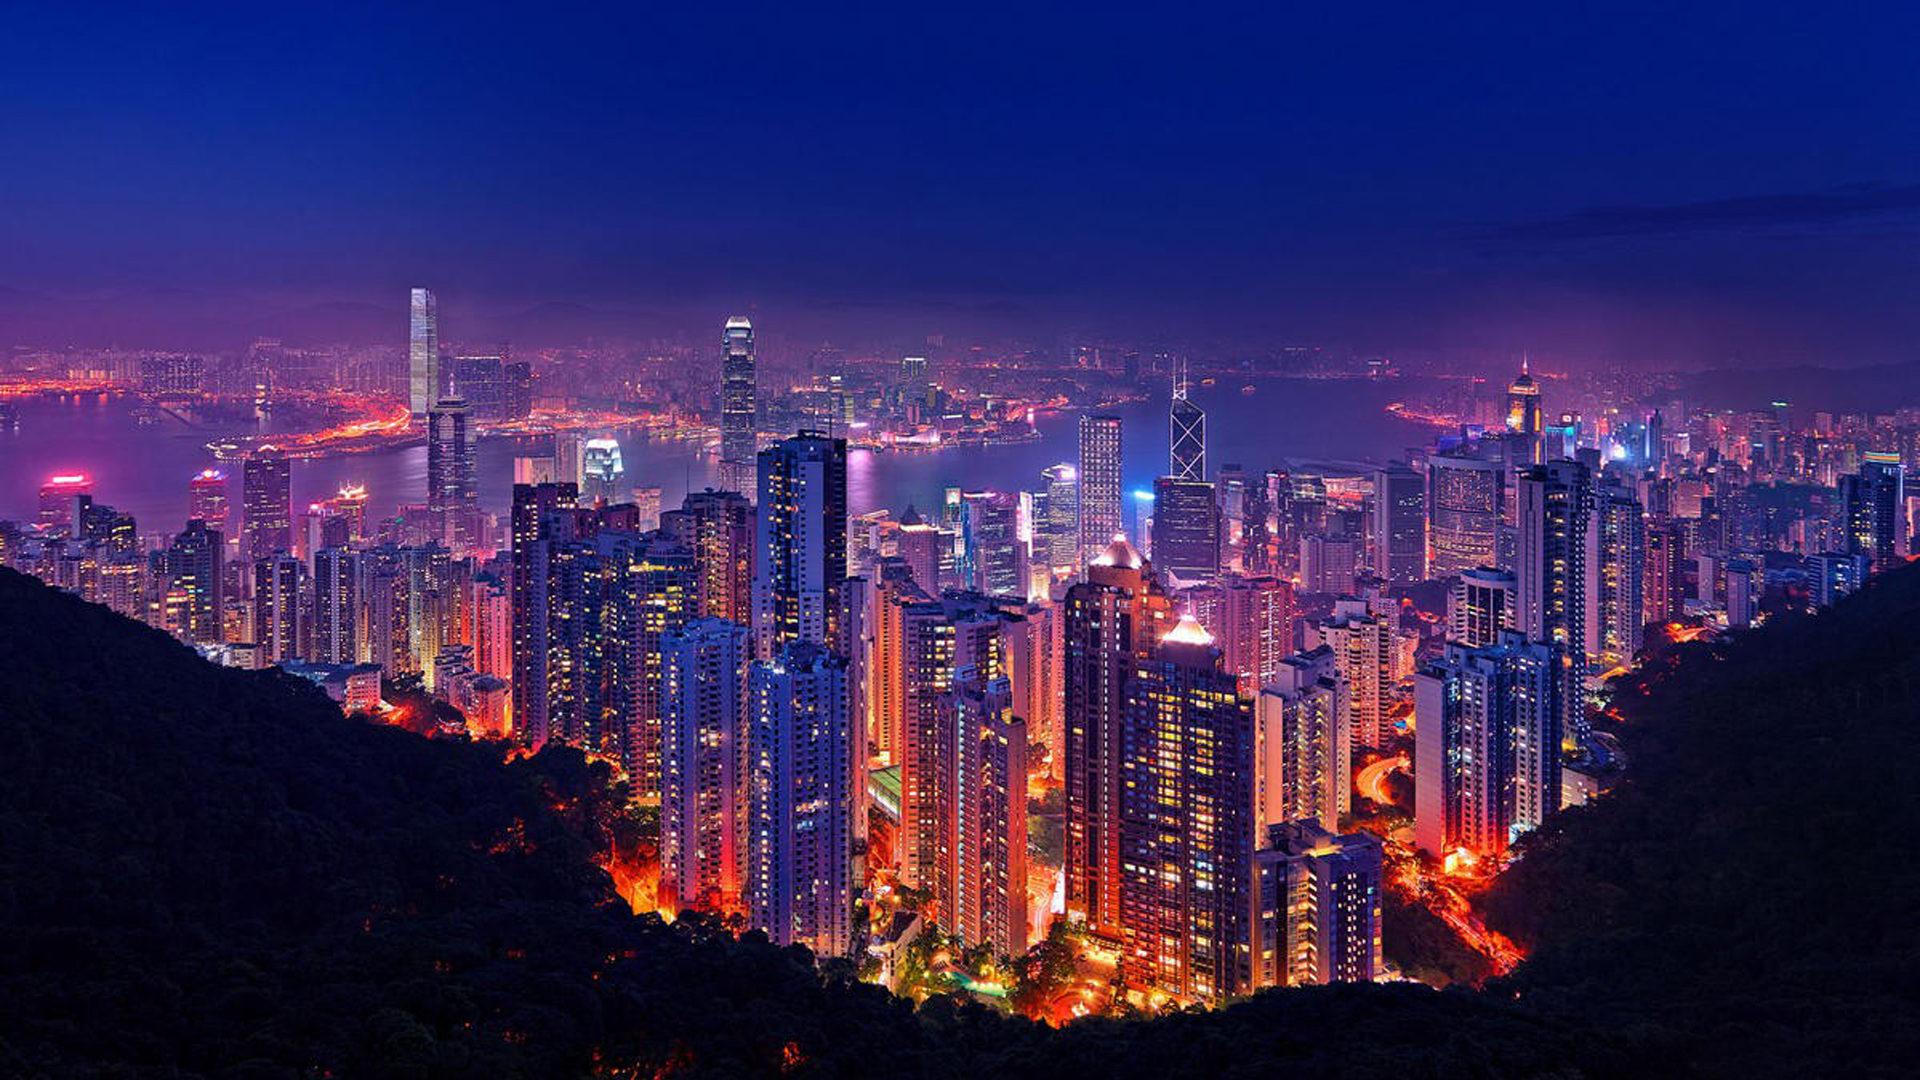 Hong Kong Iphone X Wallpaper Hong Kong At Night Lighting Buildings Skyscrapers Port